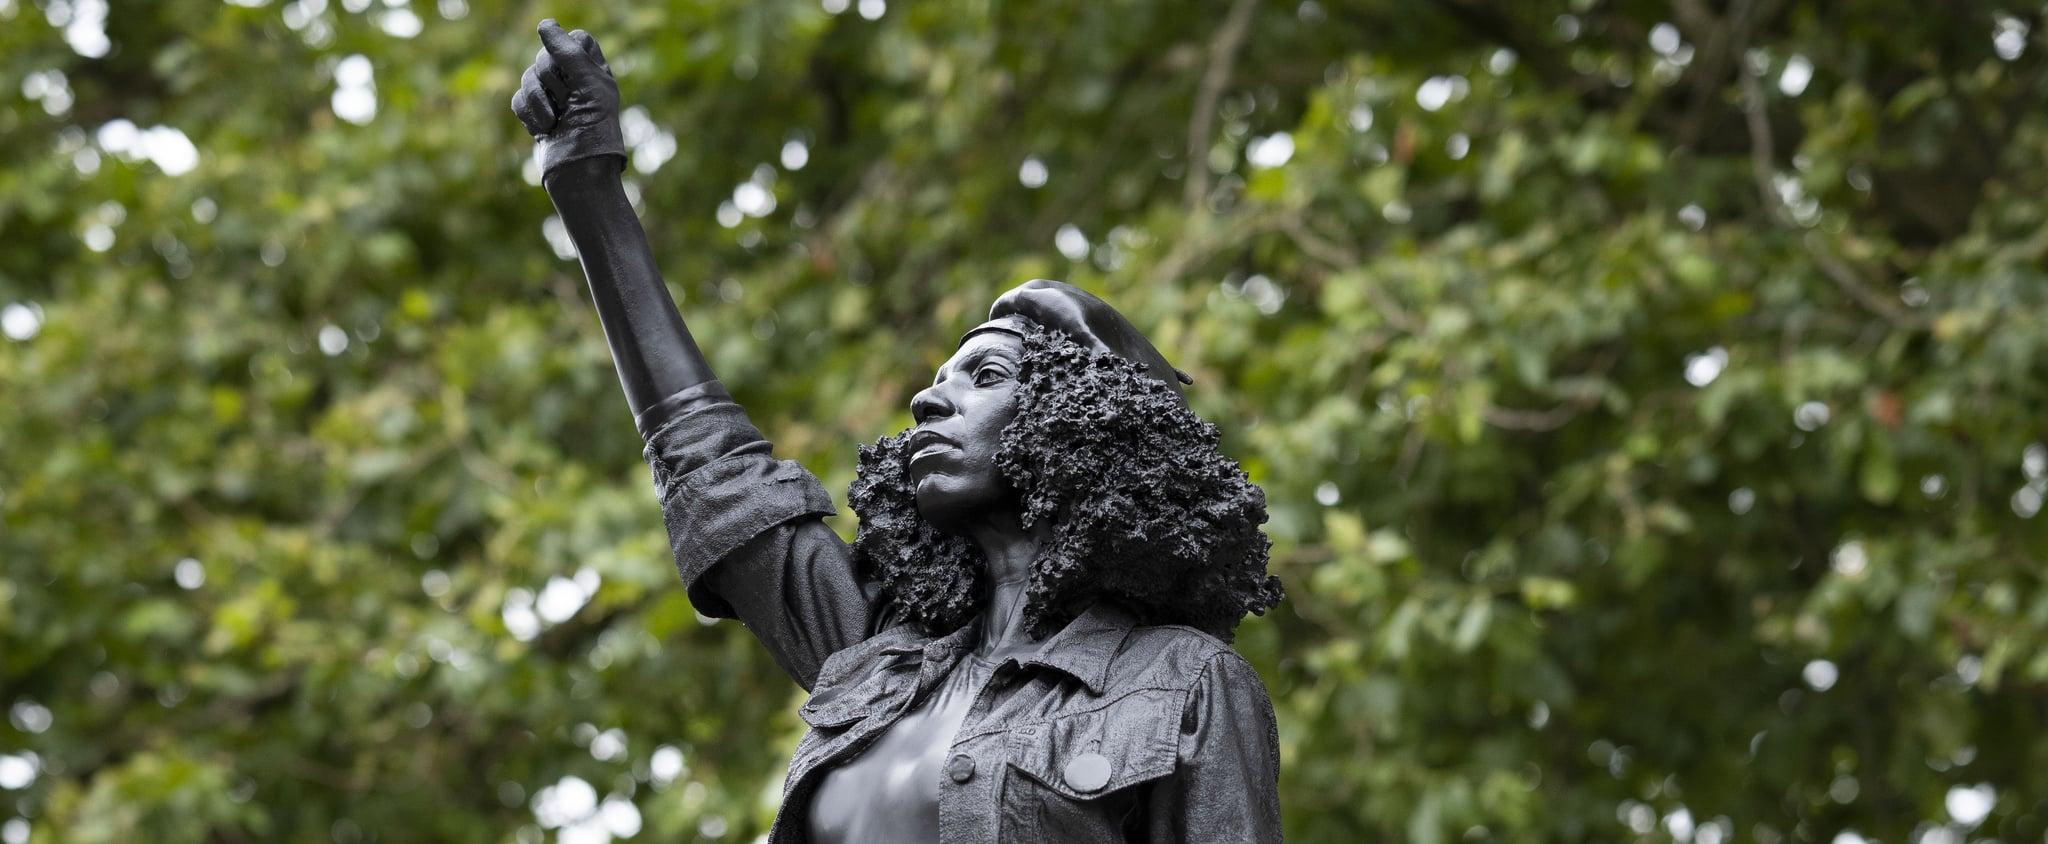 BLM Protestor Jen Reid Replaces Edward Colston Statue